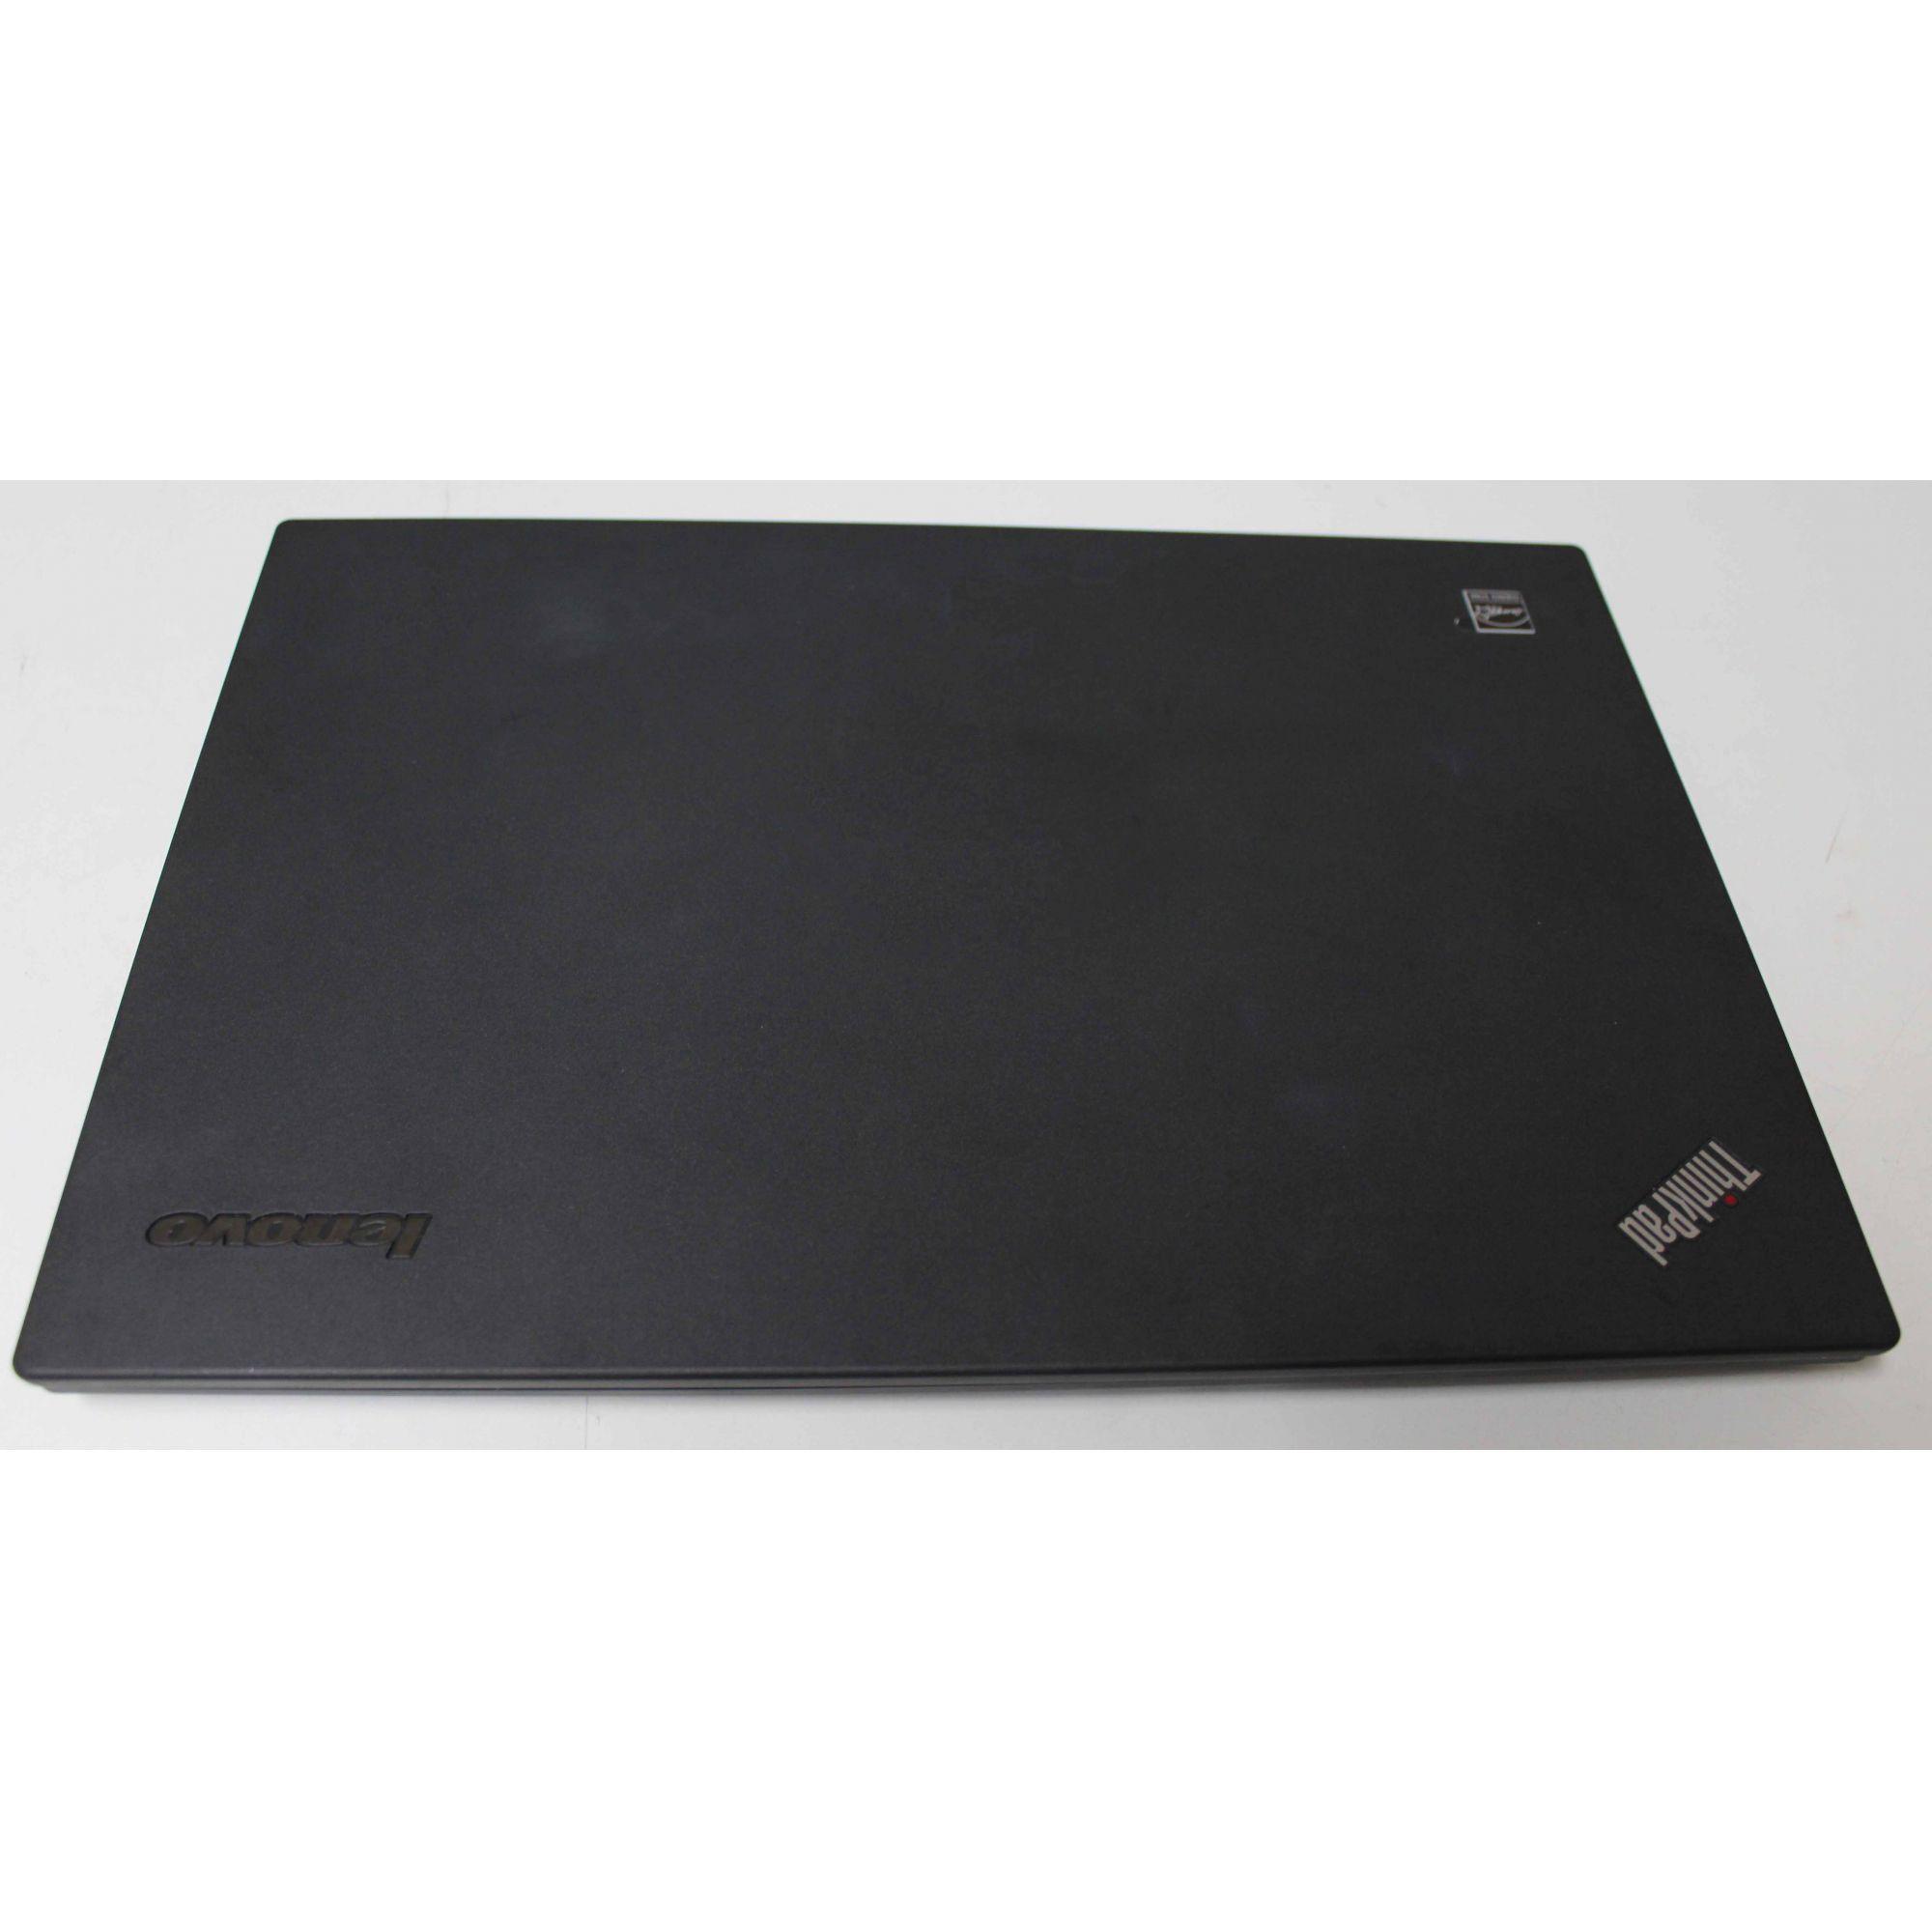 "Notebook Lenovo Thinkpad T450 14"" Intel Core i5 2.3GHz 4GB SSD-128GB"